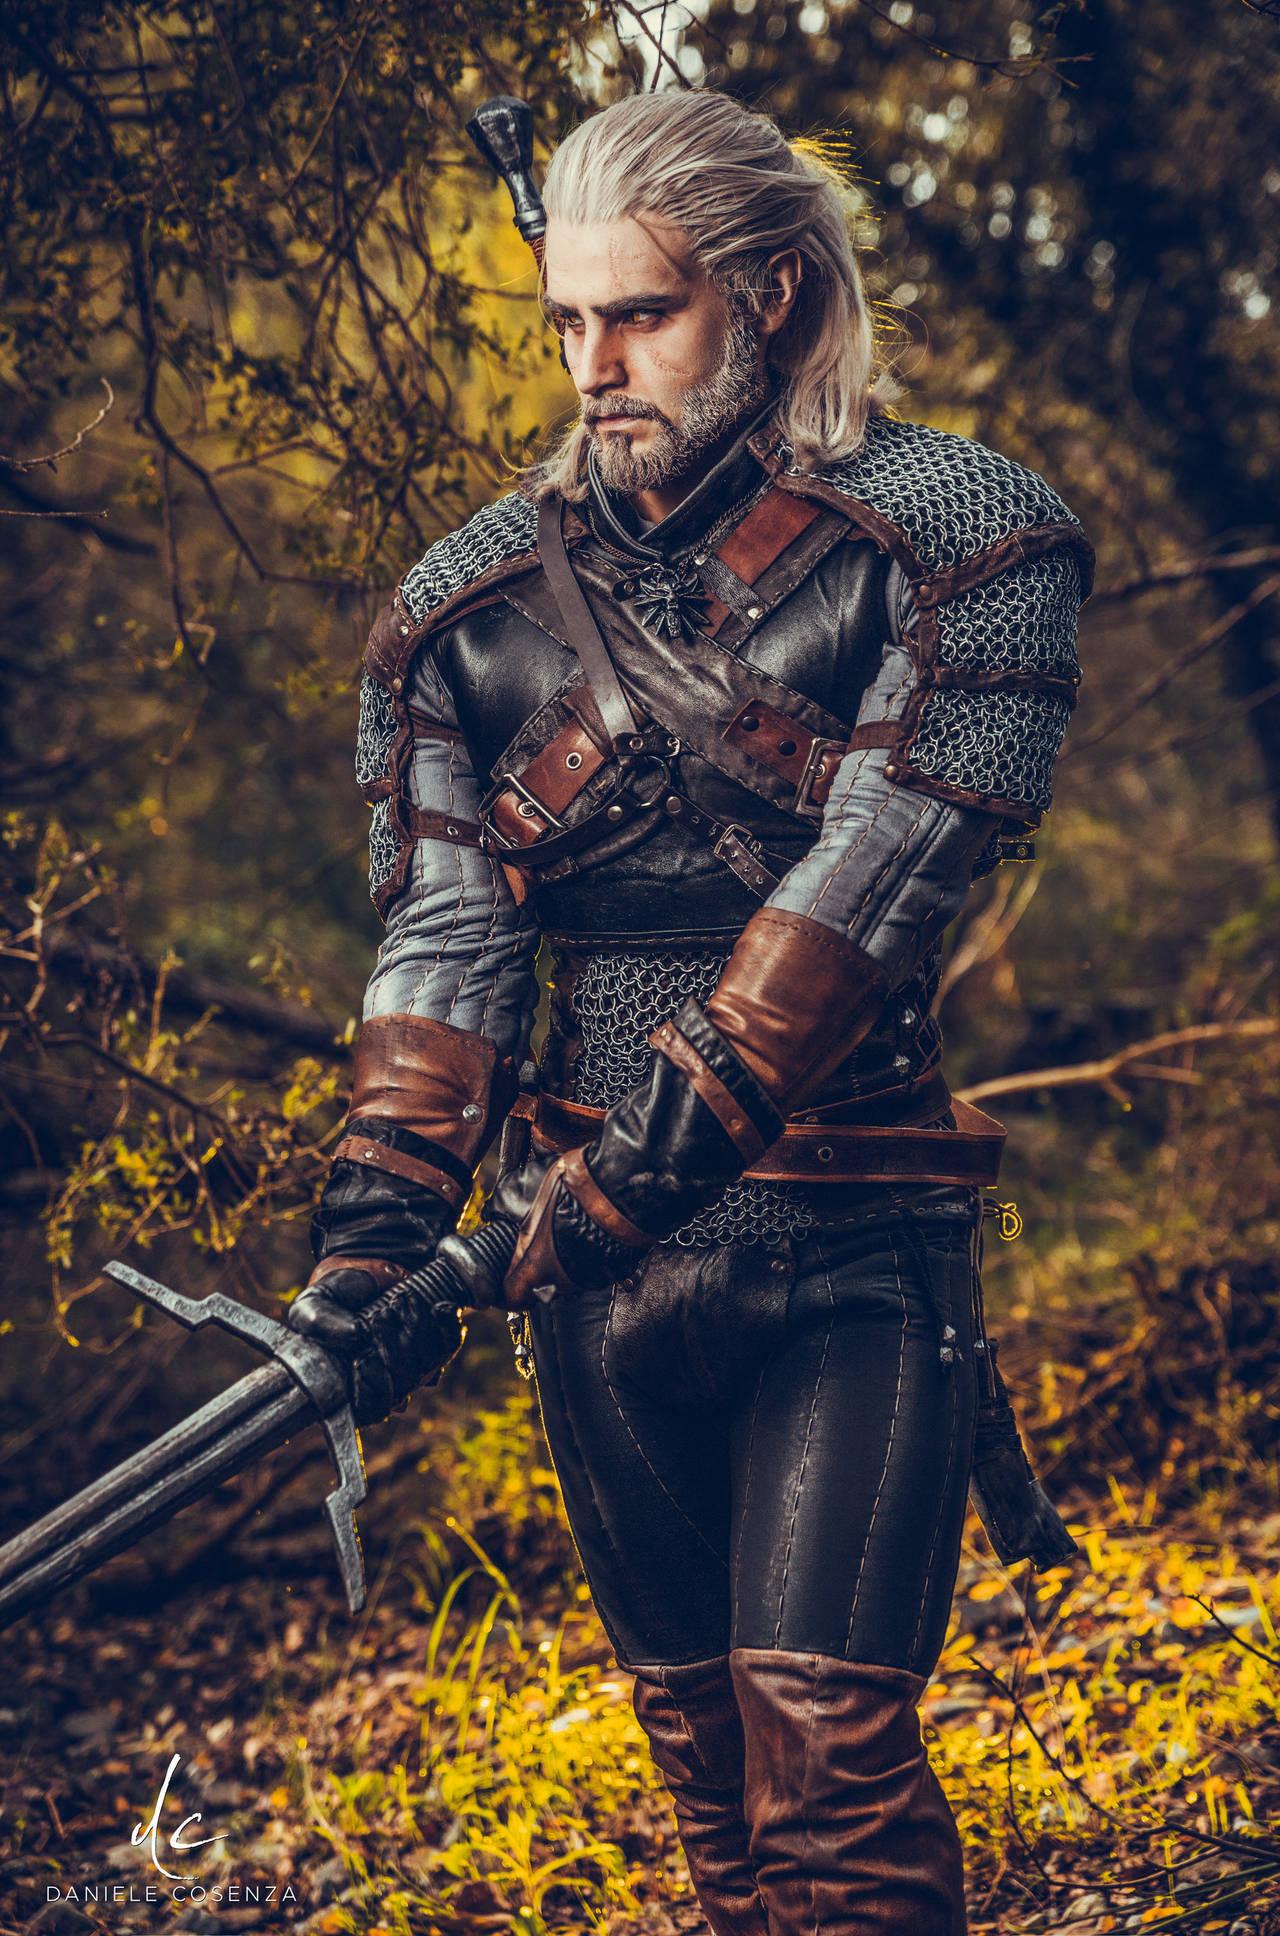 uCcv9ofD4ik.jpg - Witcher 3: Wild Hunt, the